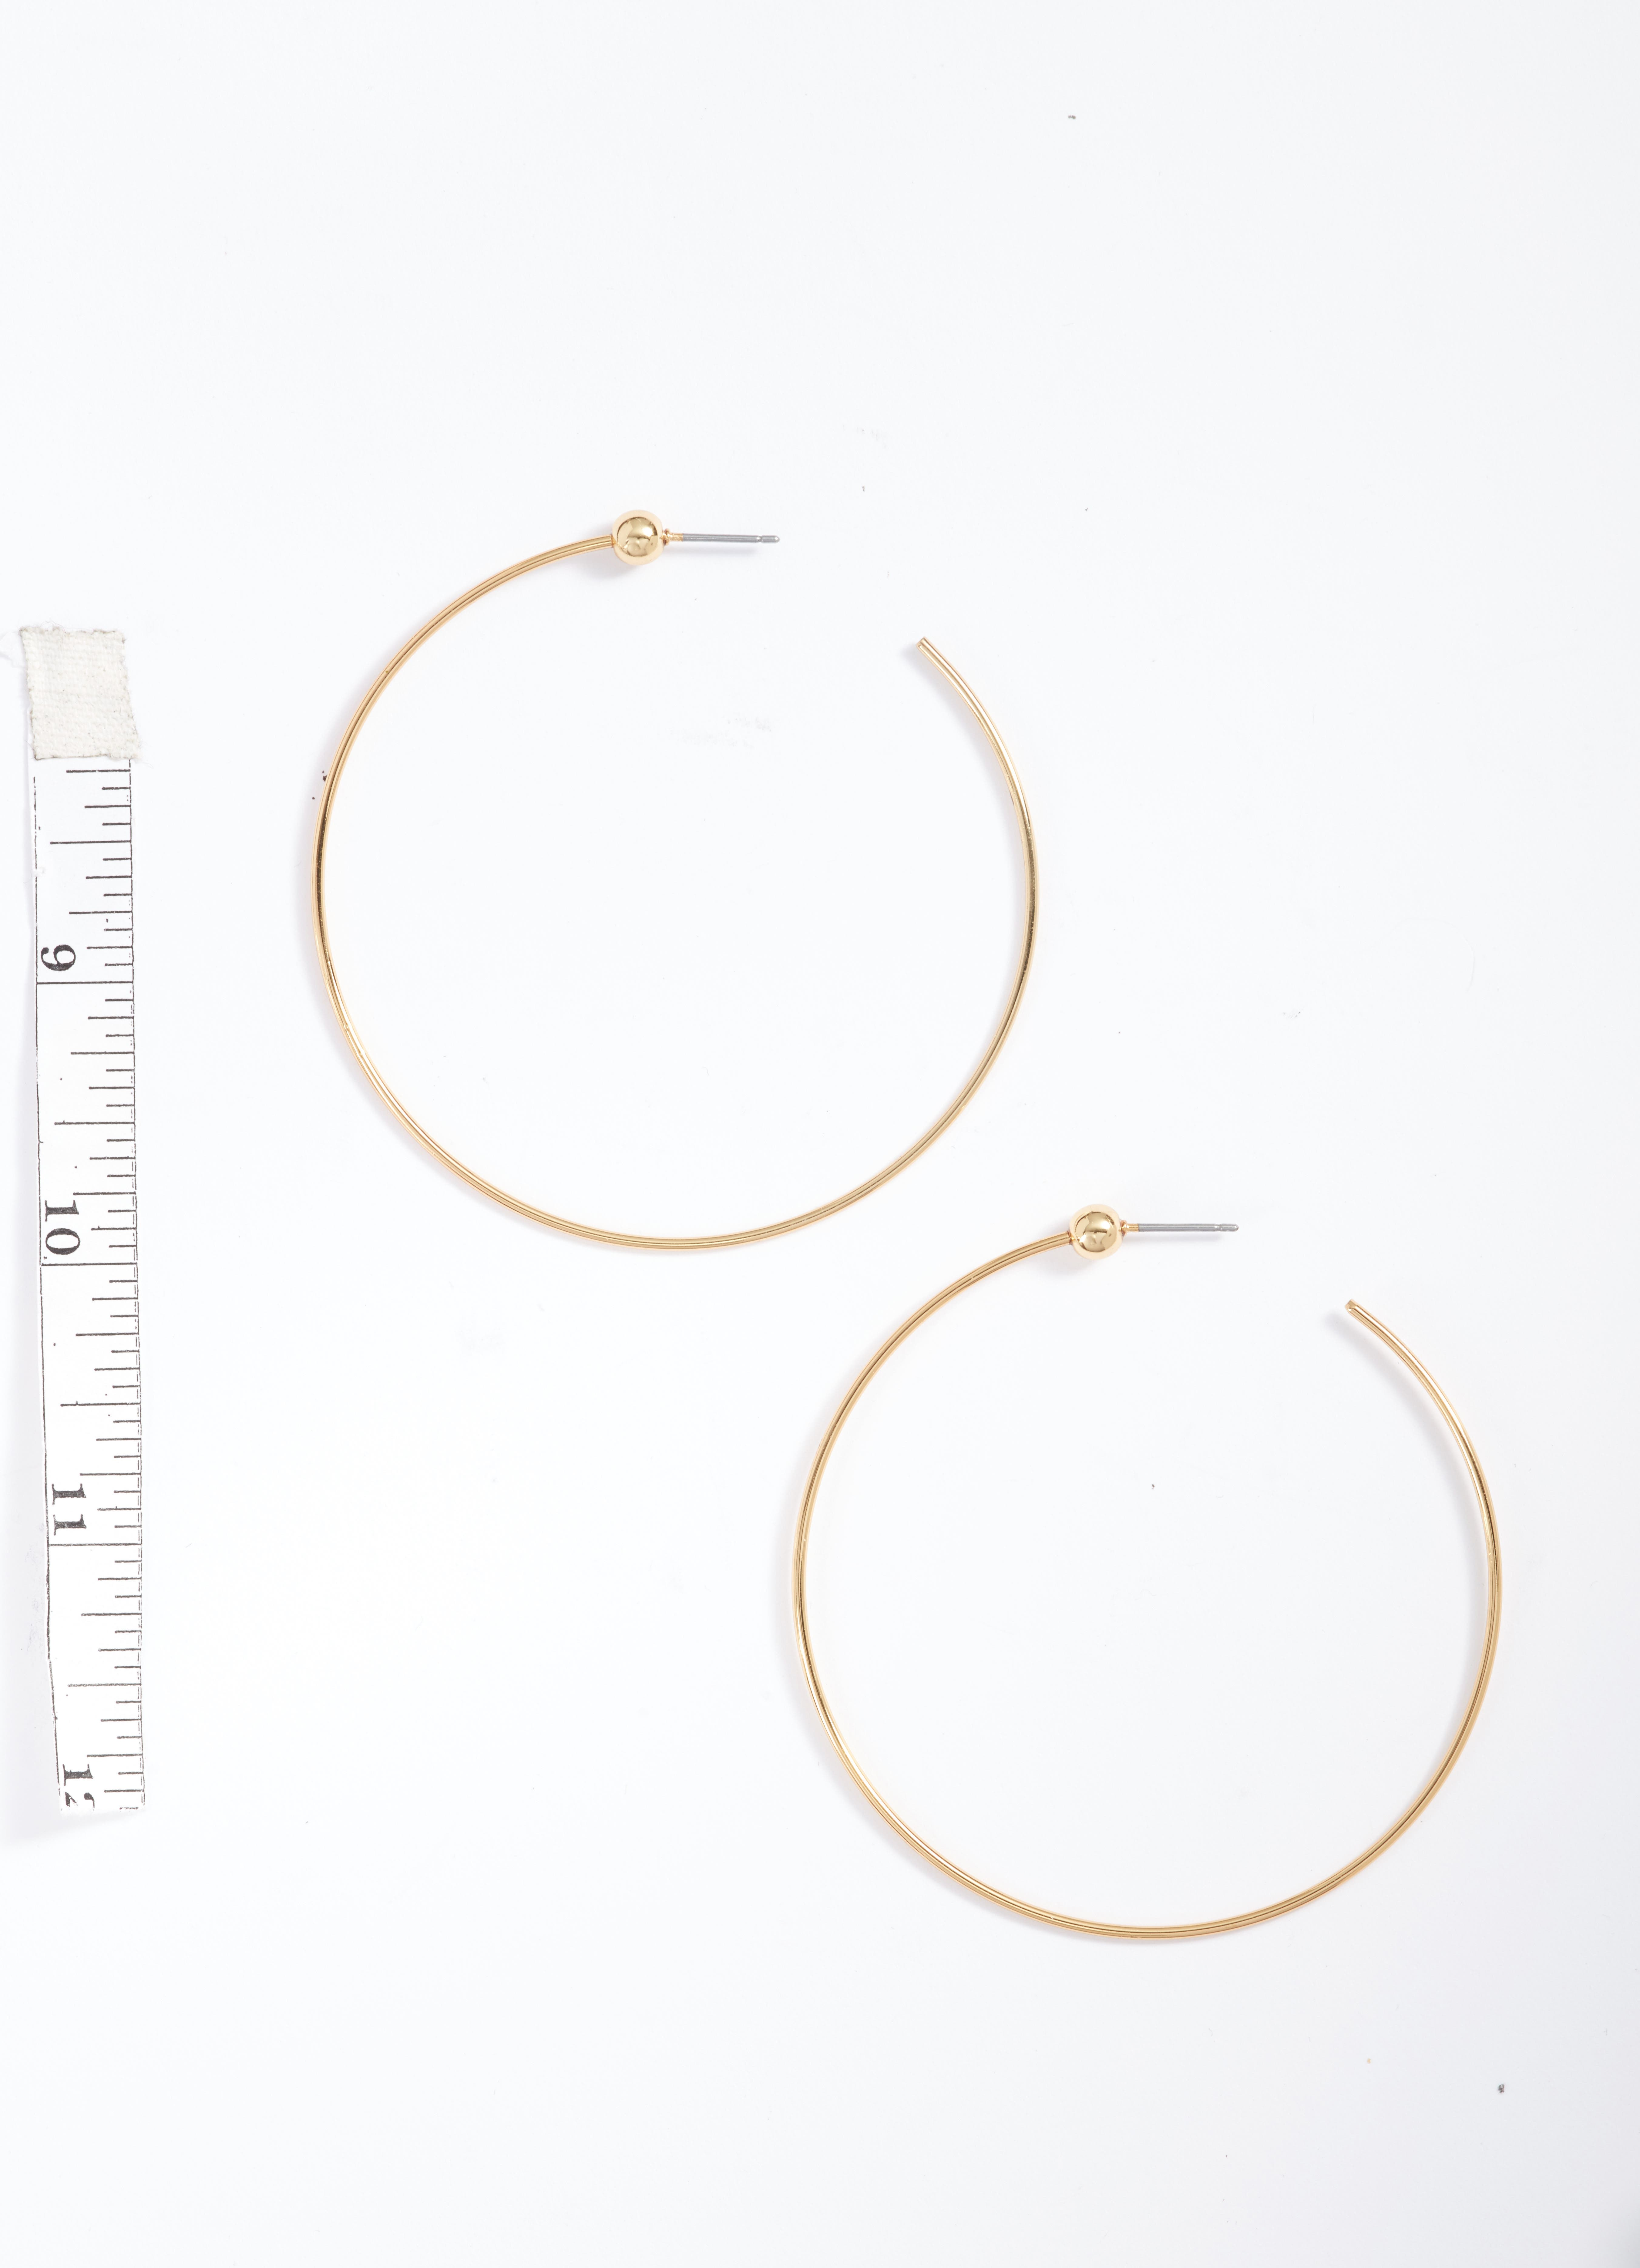 Medium Hoop Earrings,                             Alternate thumbnail 4, color,